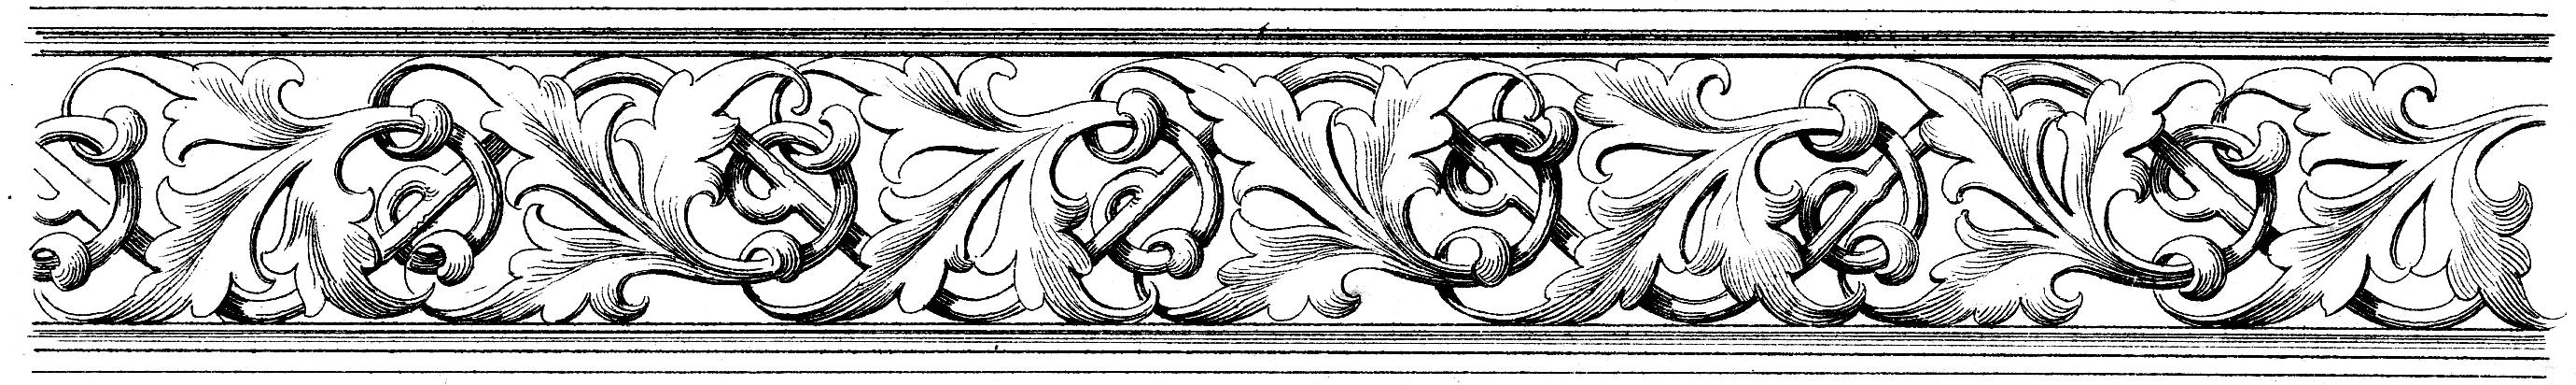 Black And White Ornamental Image